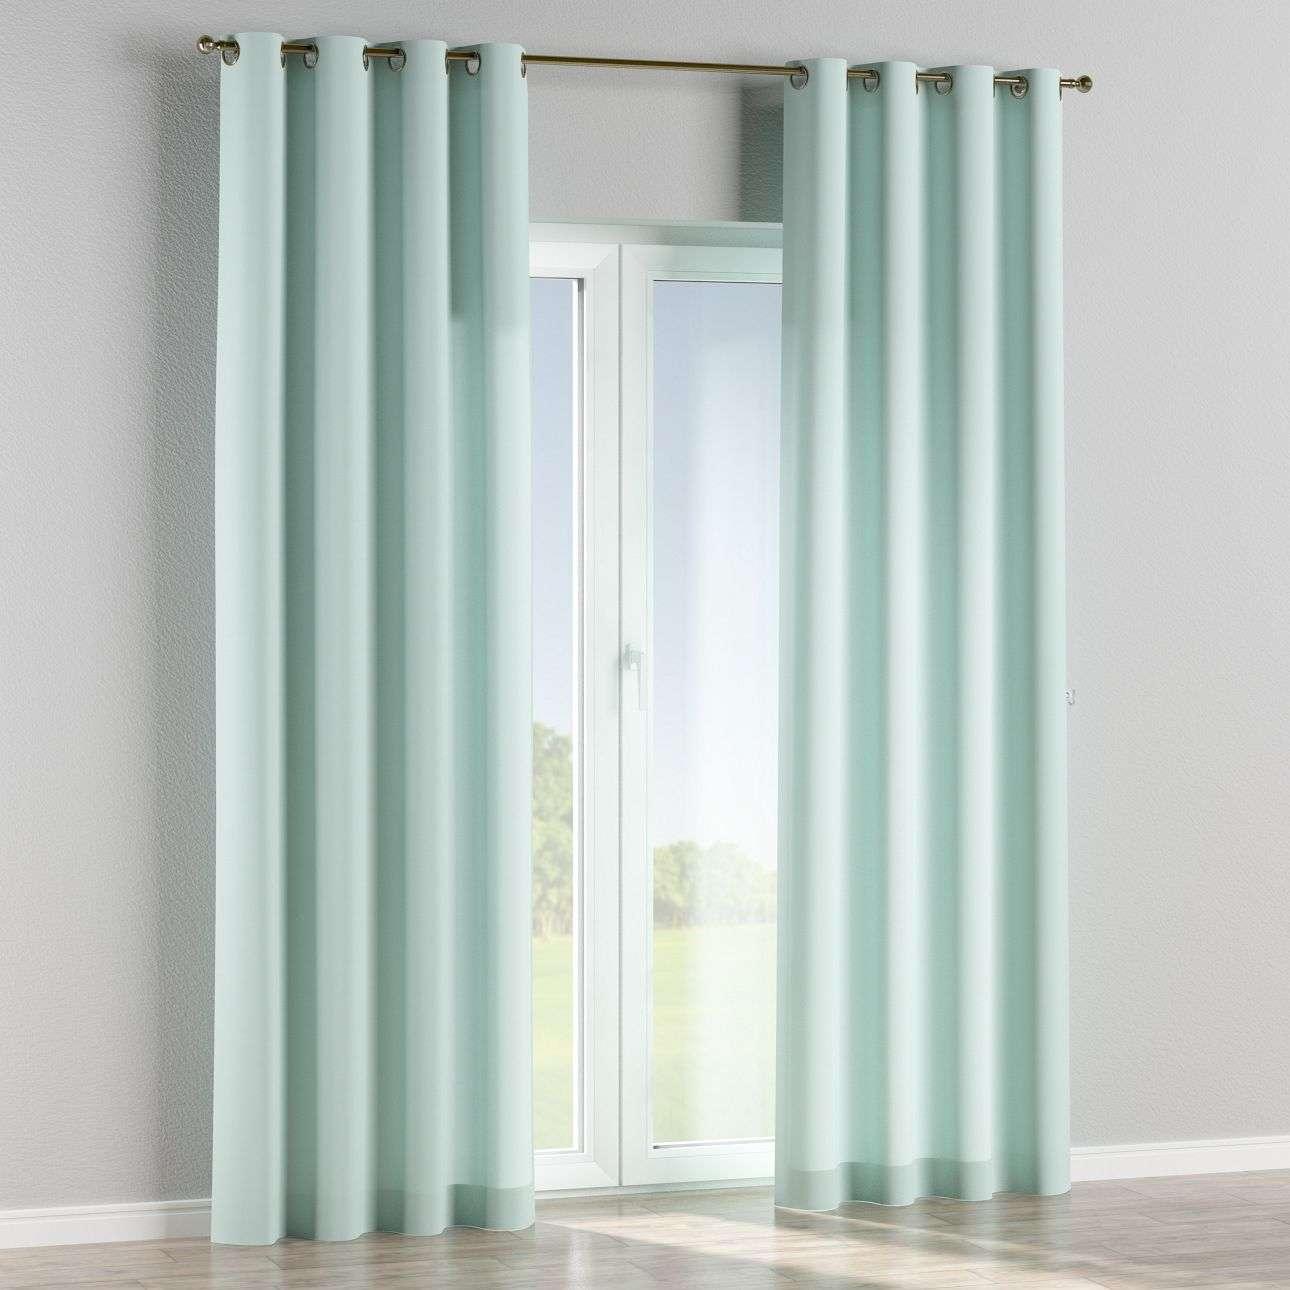 Gardin med öljetter 1 längd 130 x 260 cm i kollektionen Panama Cotton , Tyg: 702-10